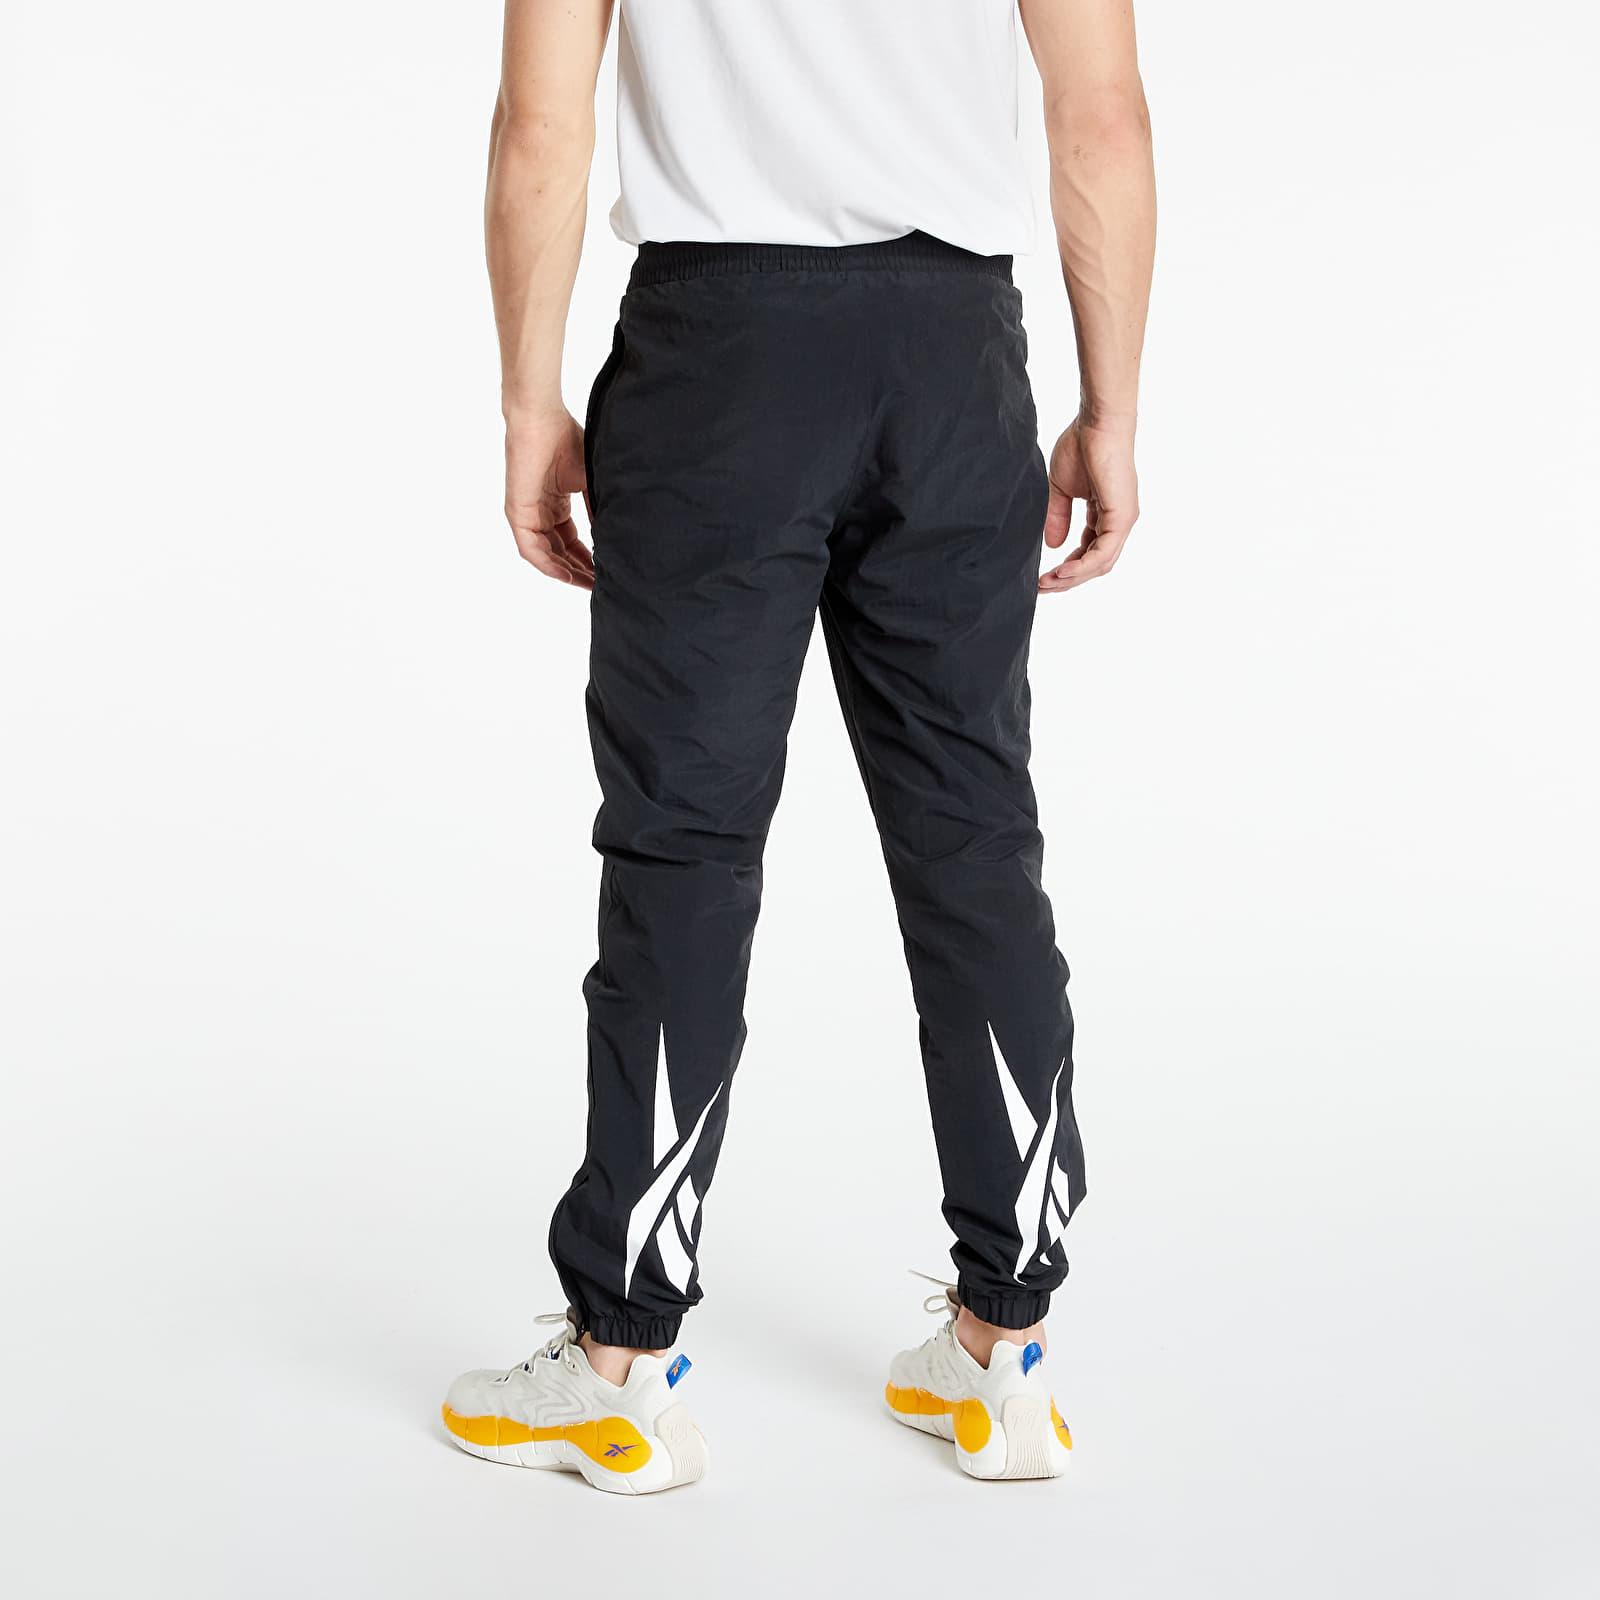 Reebok Classics F Fr Track Pants Black/ Black S